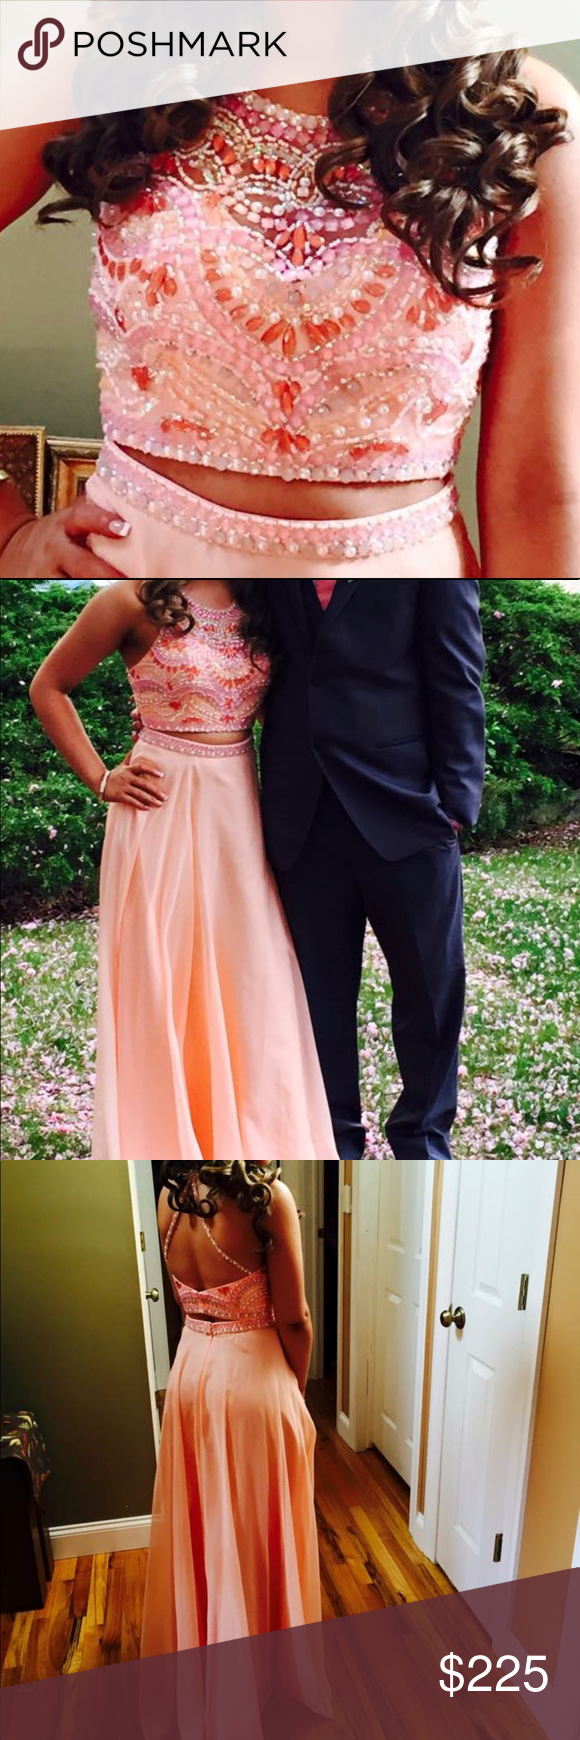 Prom dress blush dresses blush prom and dress prom